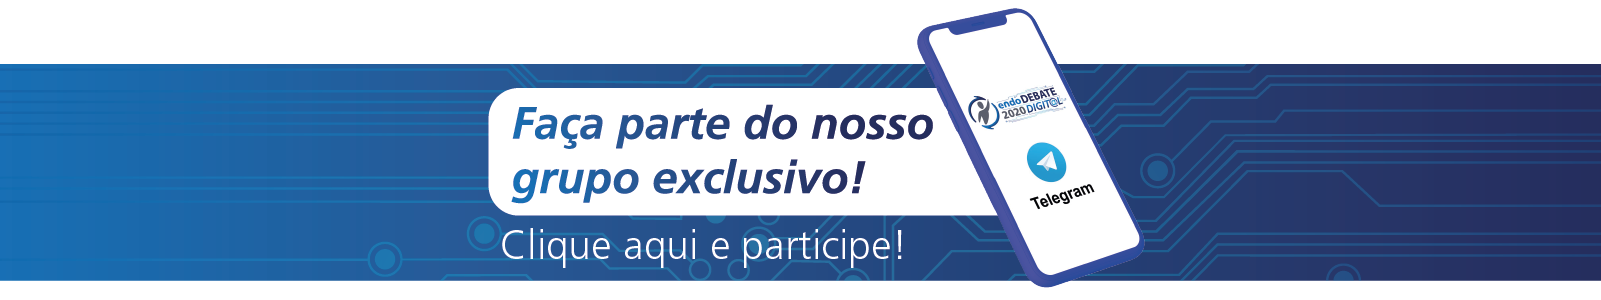 endodebate-banner-telegram-2